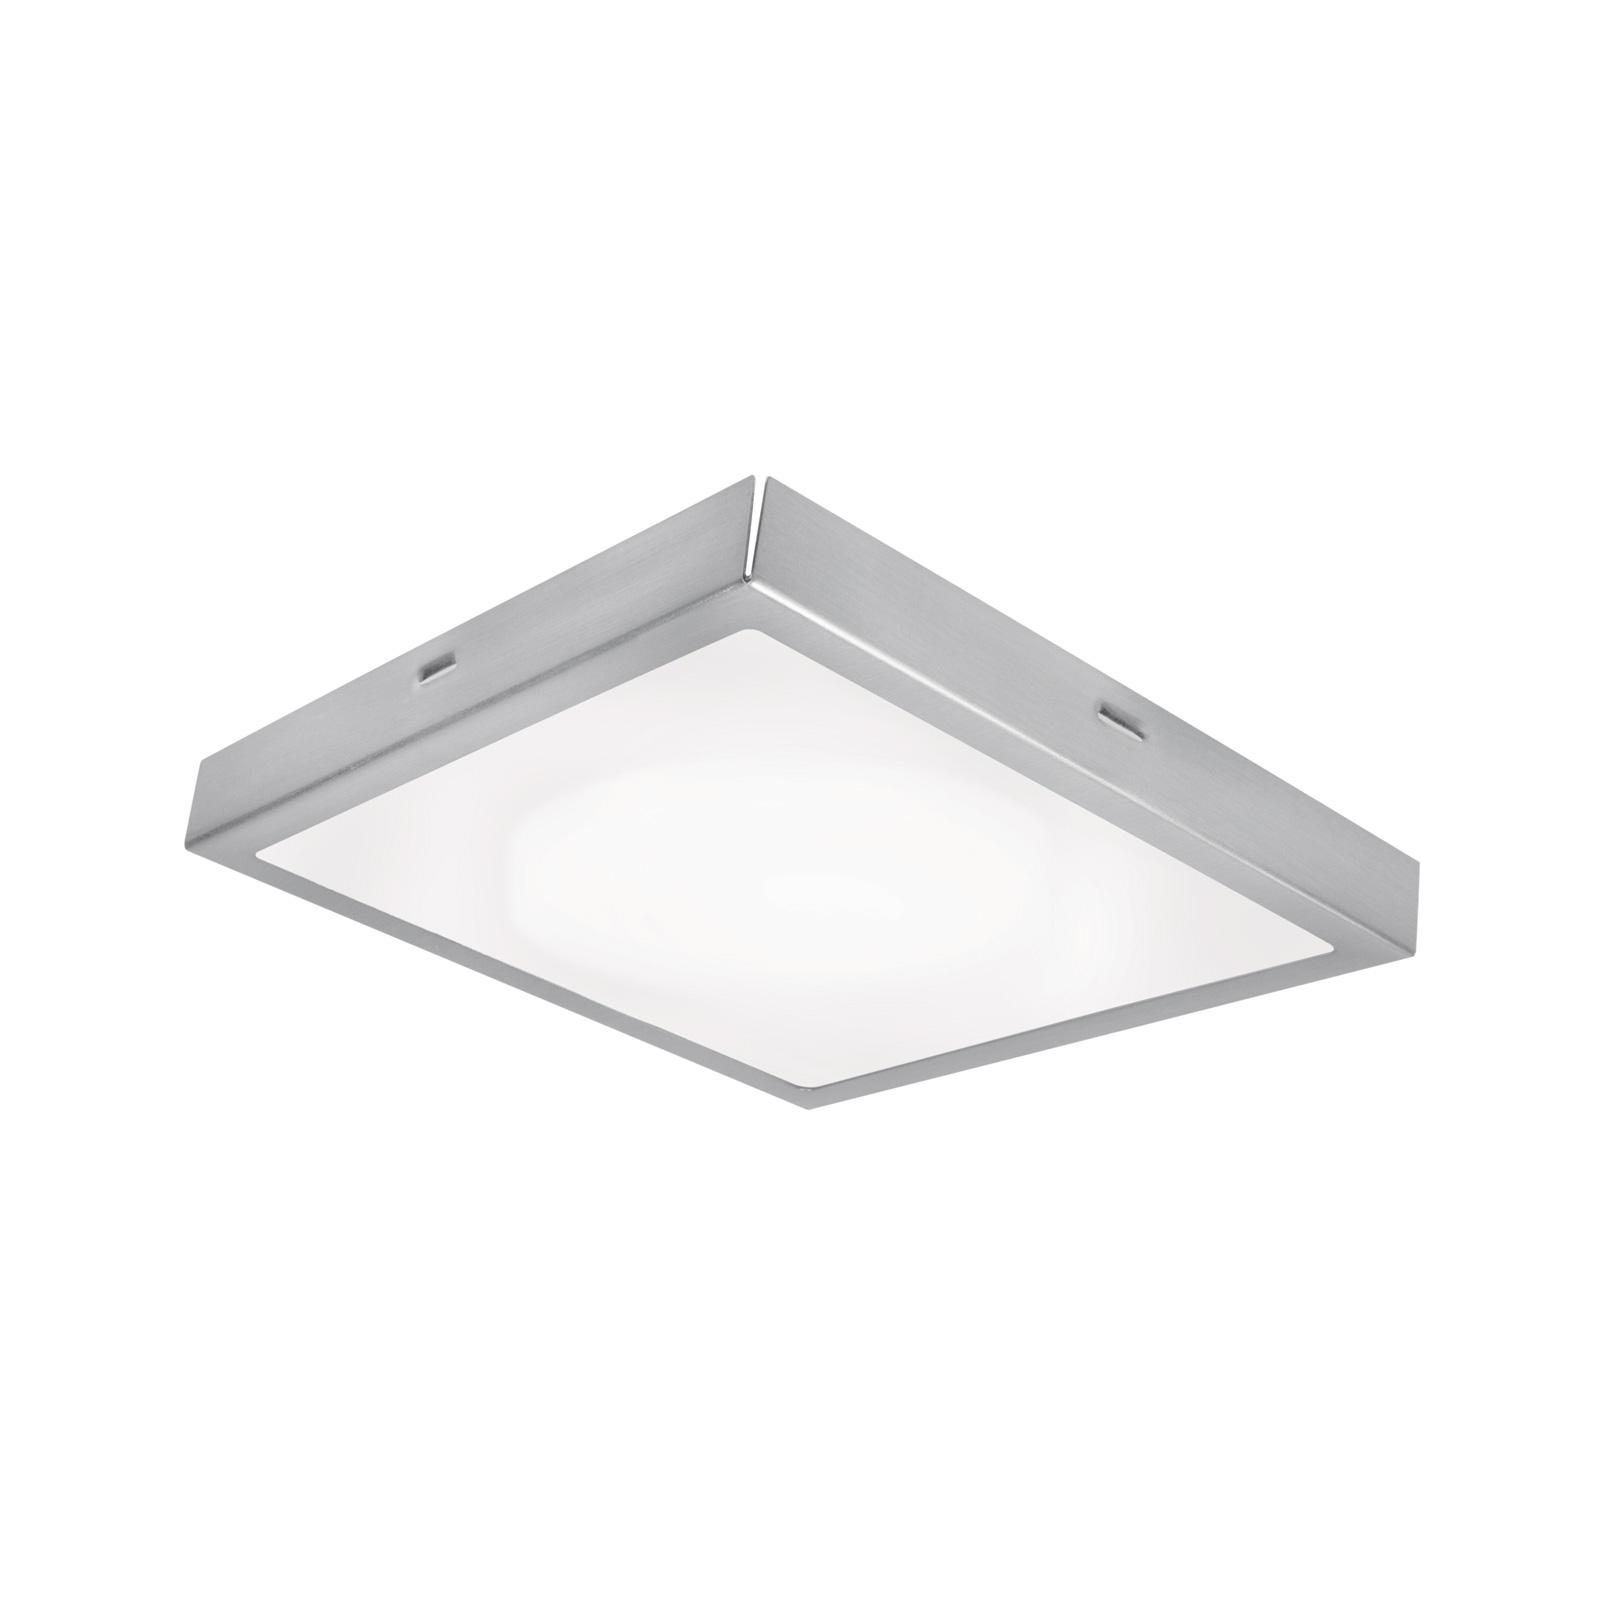 LEDVANCE Lunive Vela LED plafondlamp 22cm 3.000K